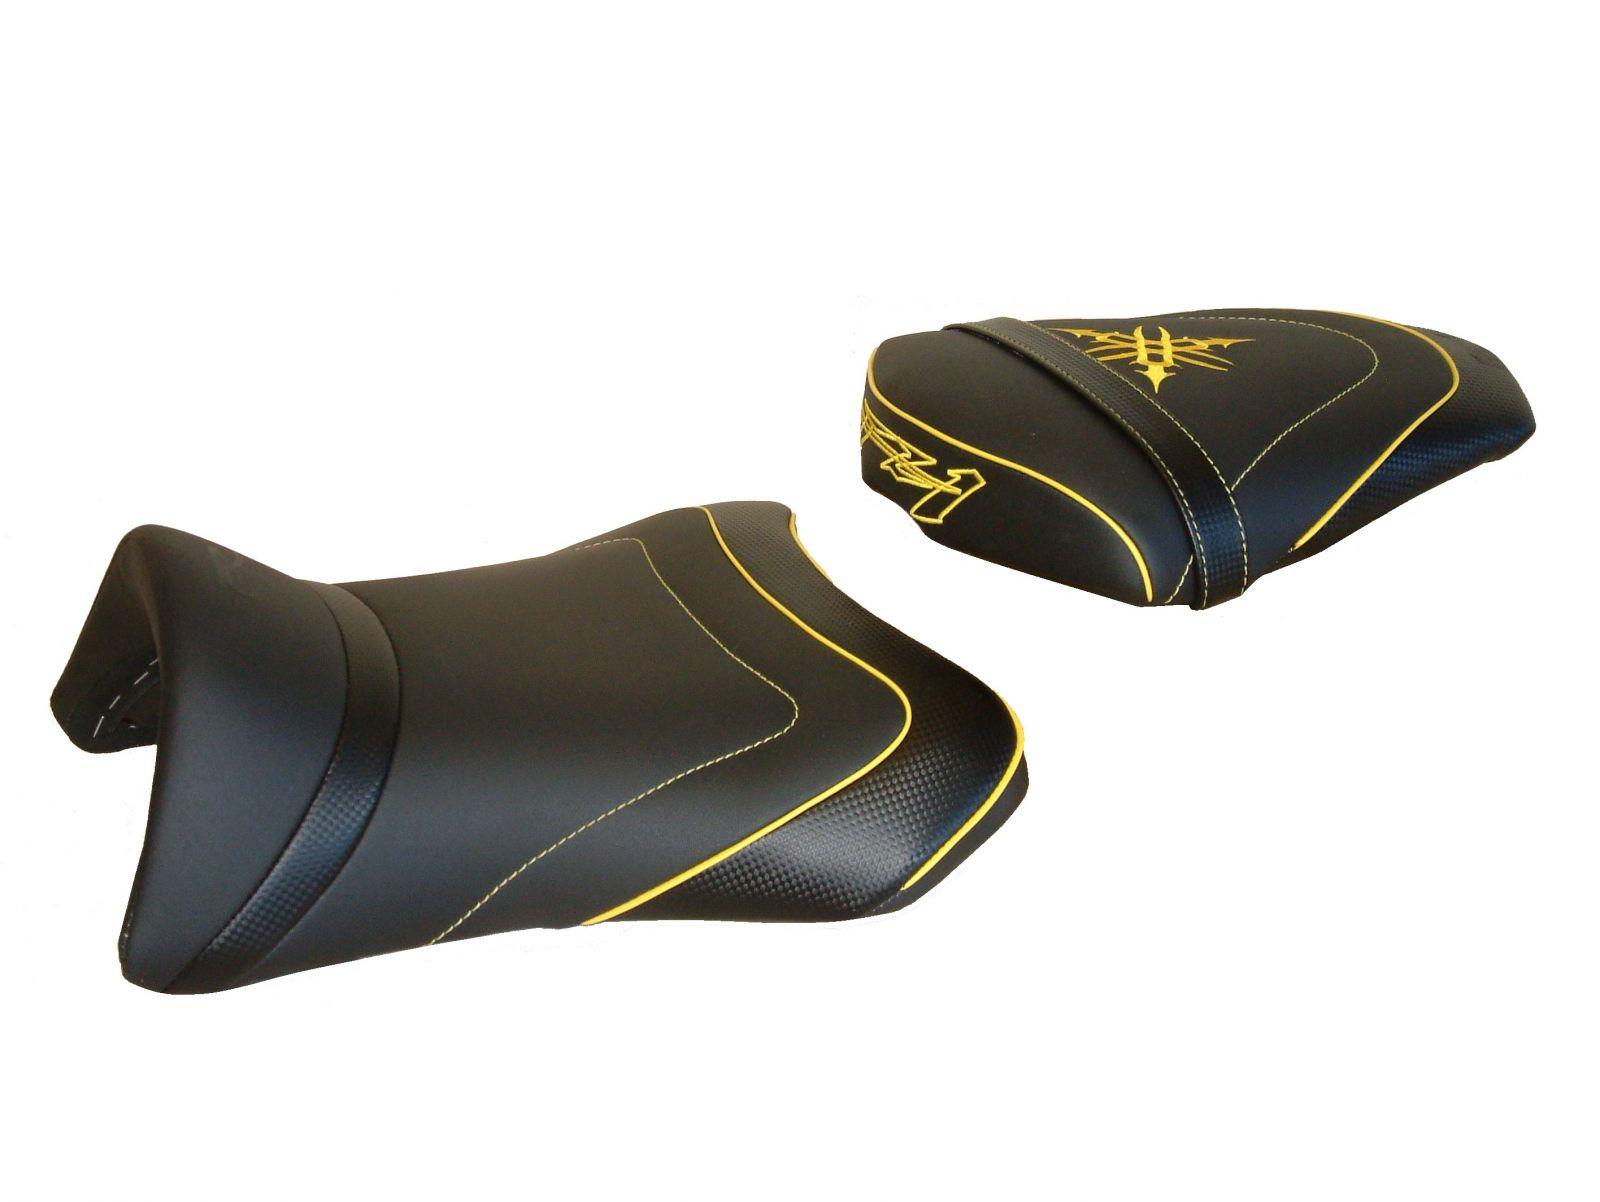 Sella Grande Confort SGC4005 - YAMAHA FZ1-N [≥ 2006]